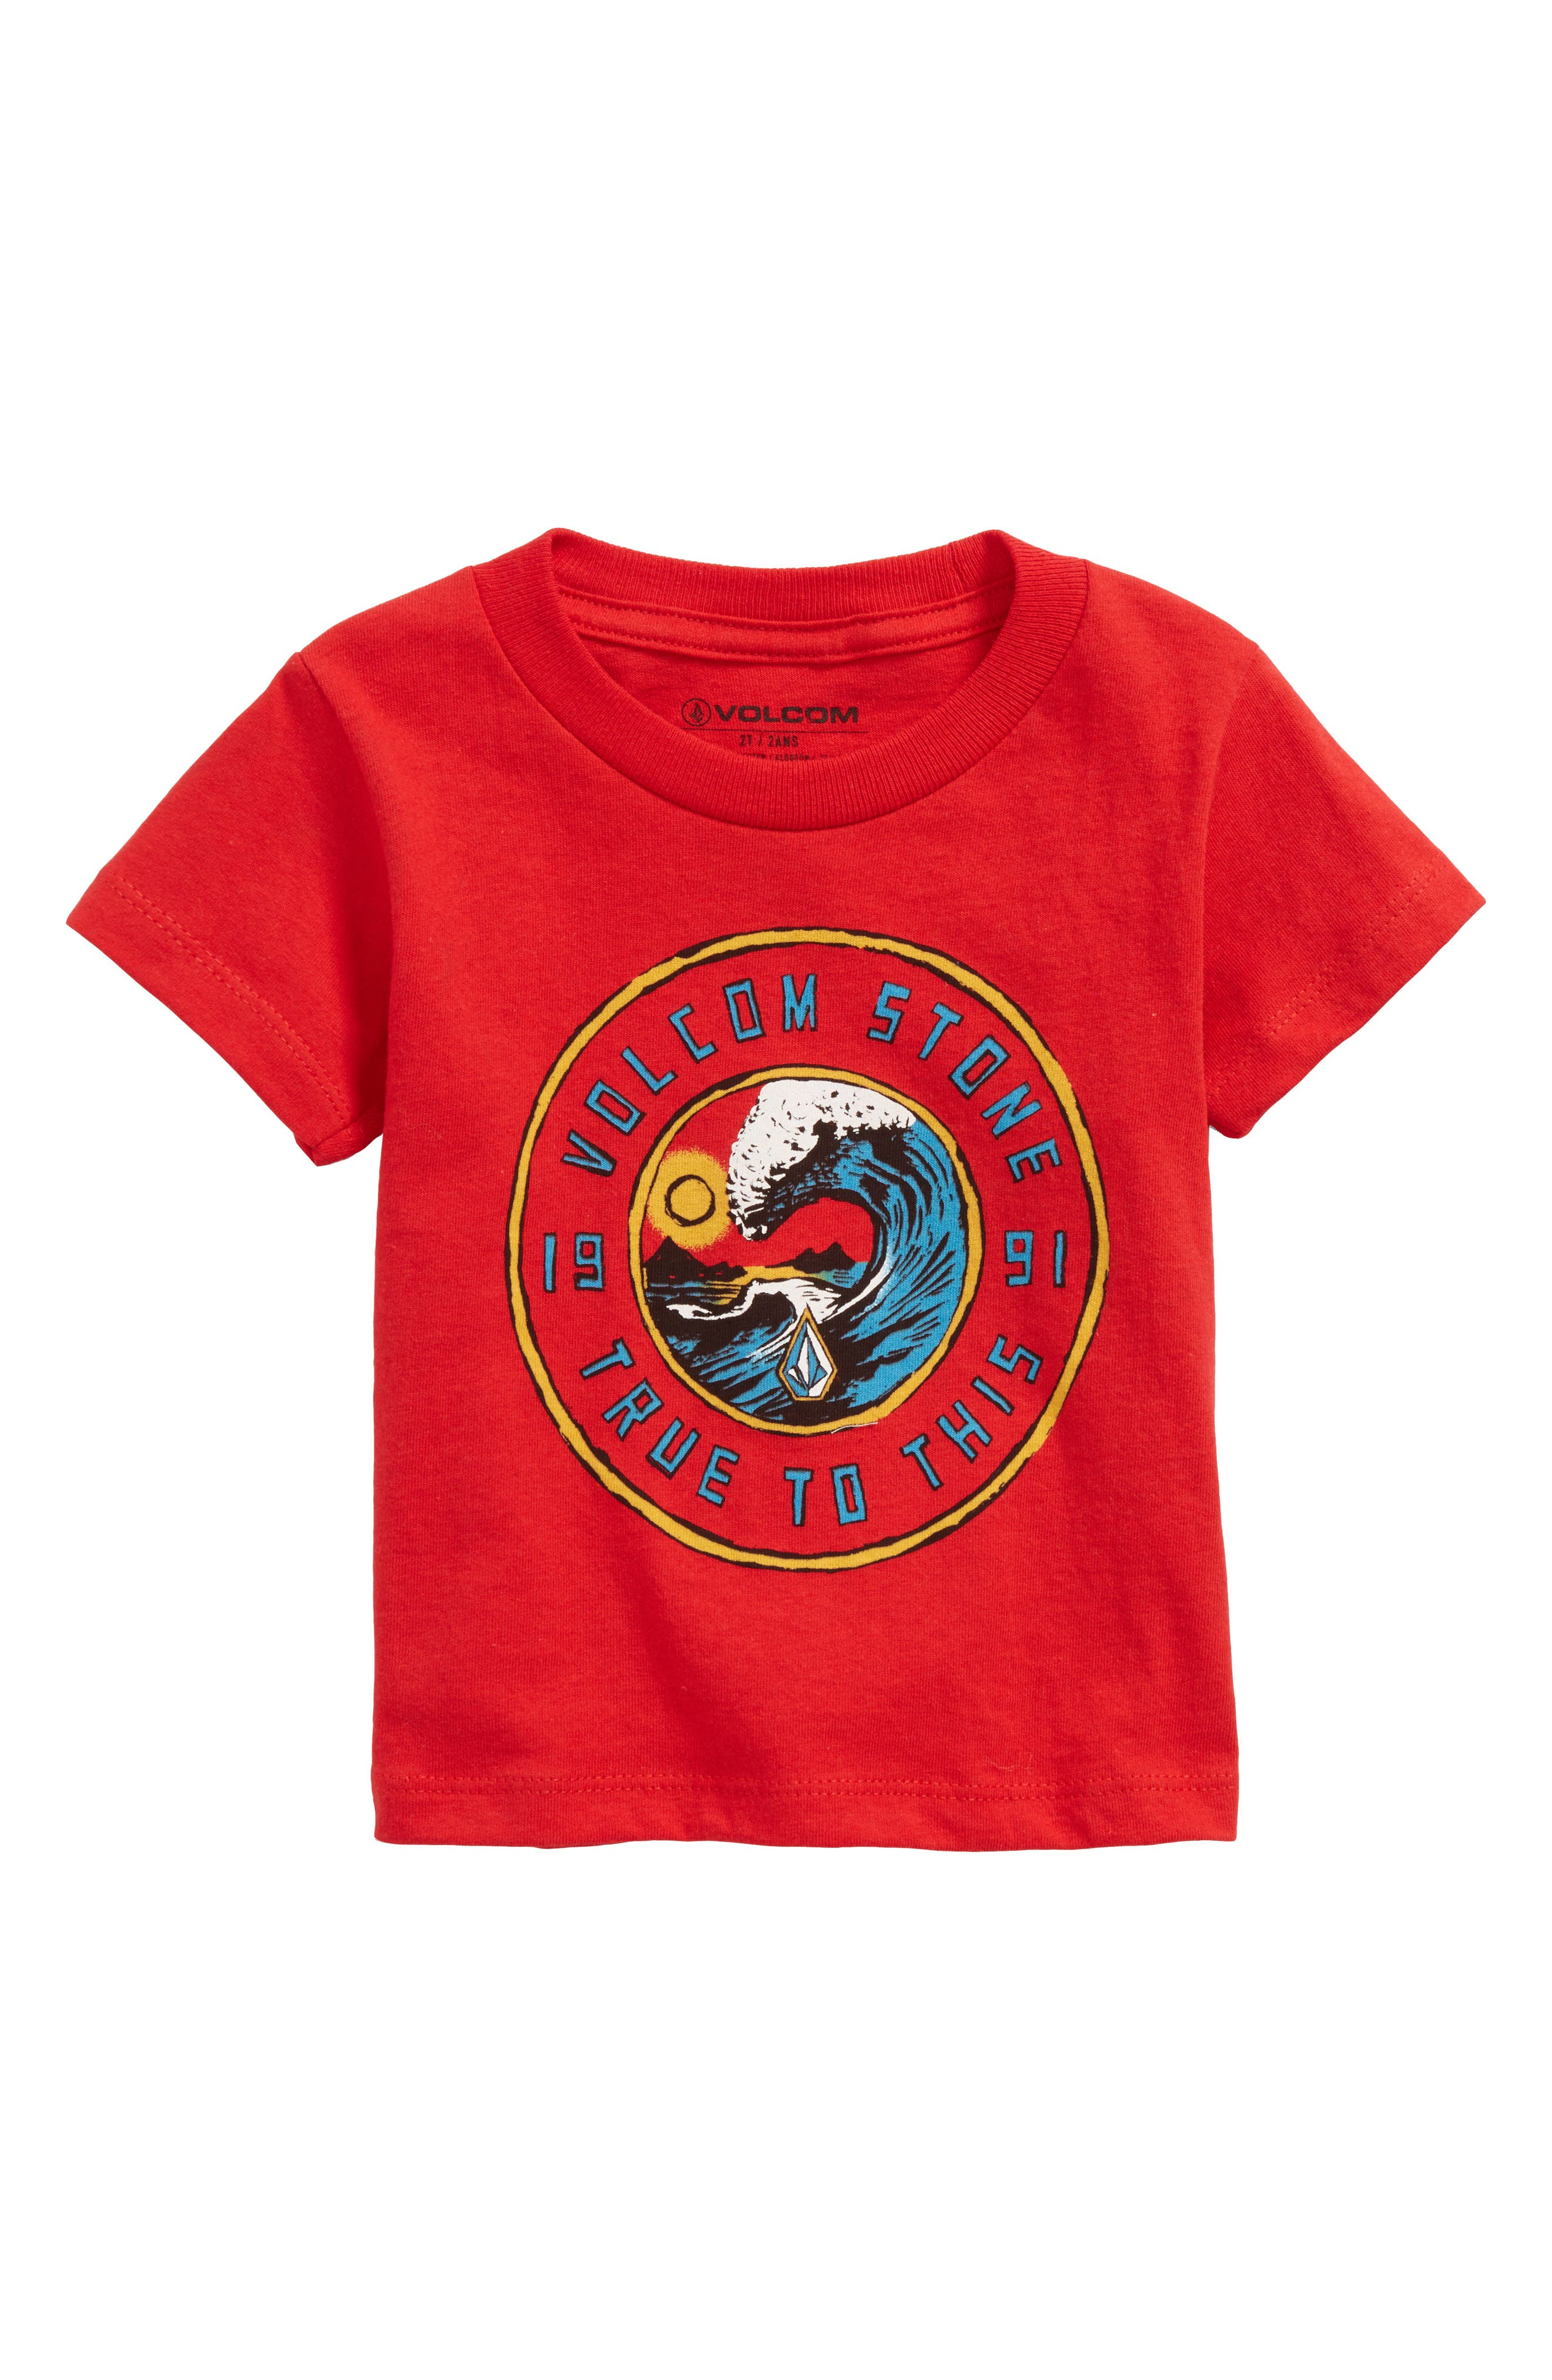 Main Image - Volcom Furnish T-Shirt (Toddler Boys & Little Boys)